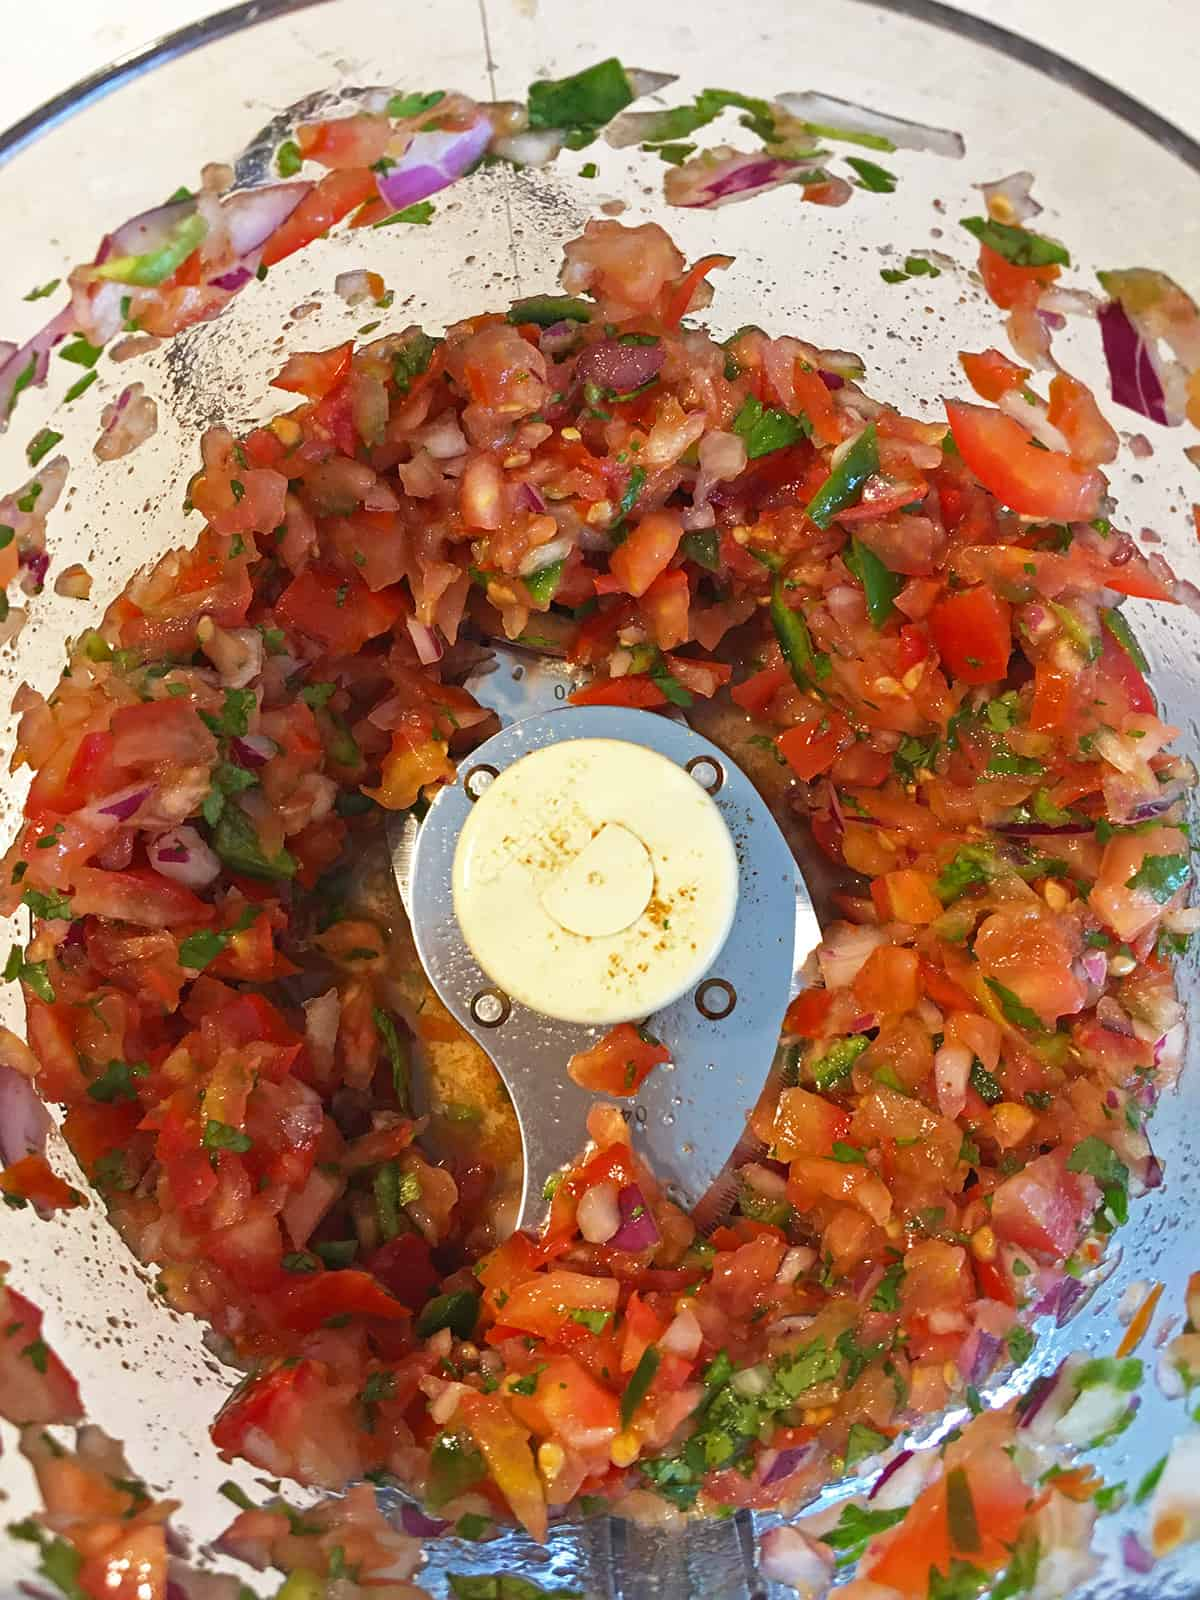 Freshly made salsa in a food processor